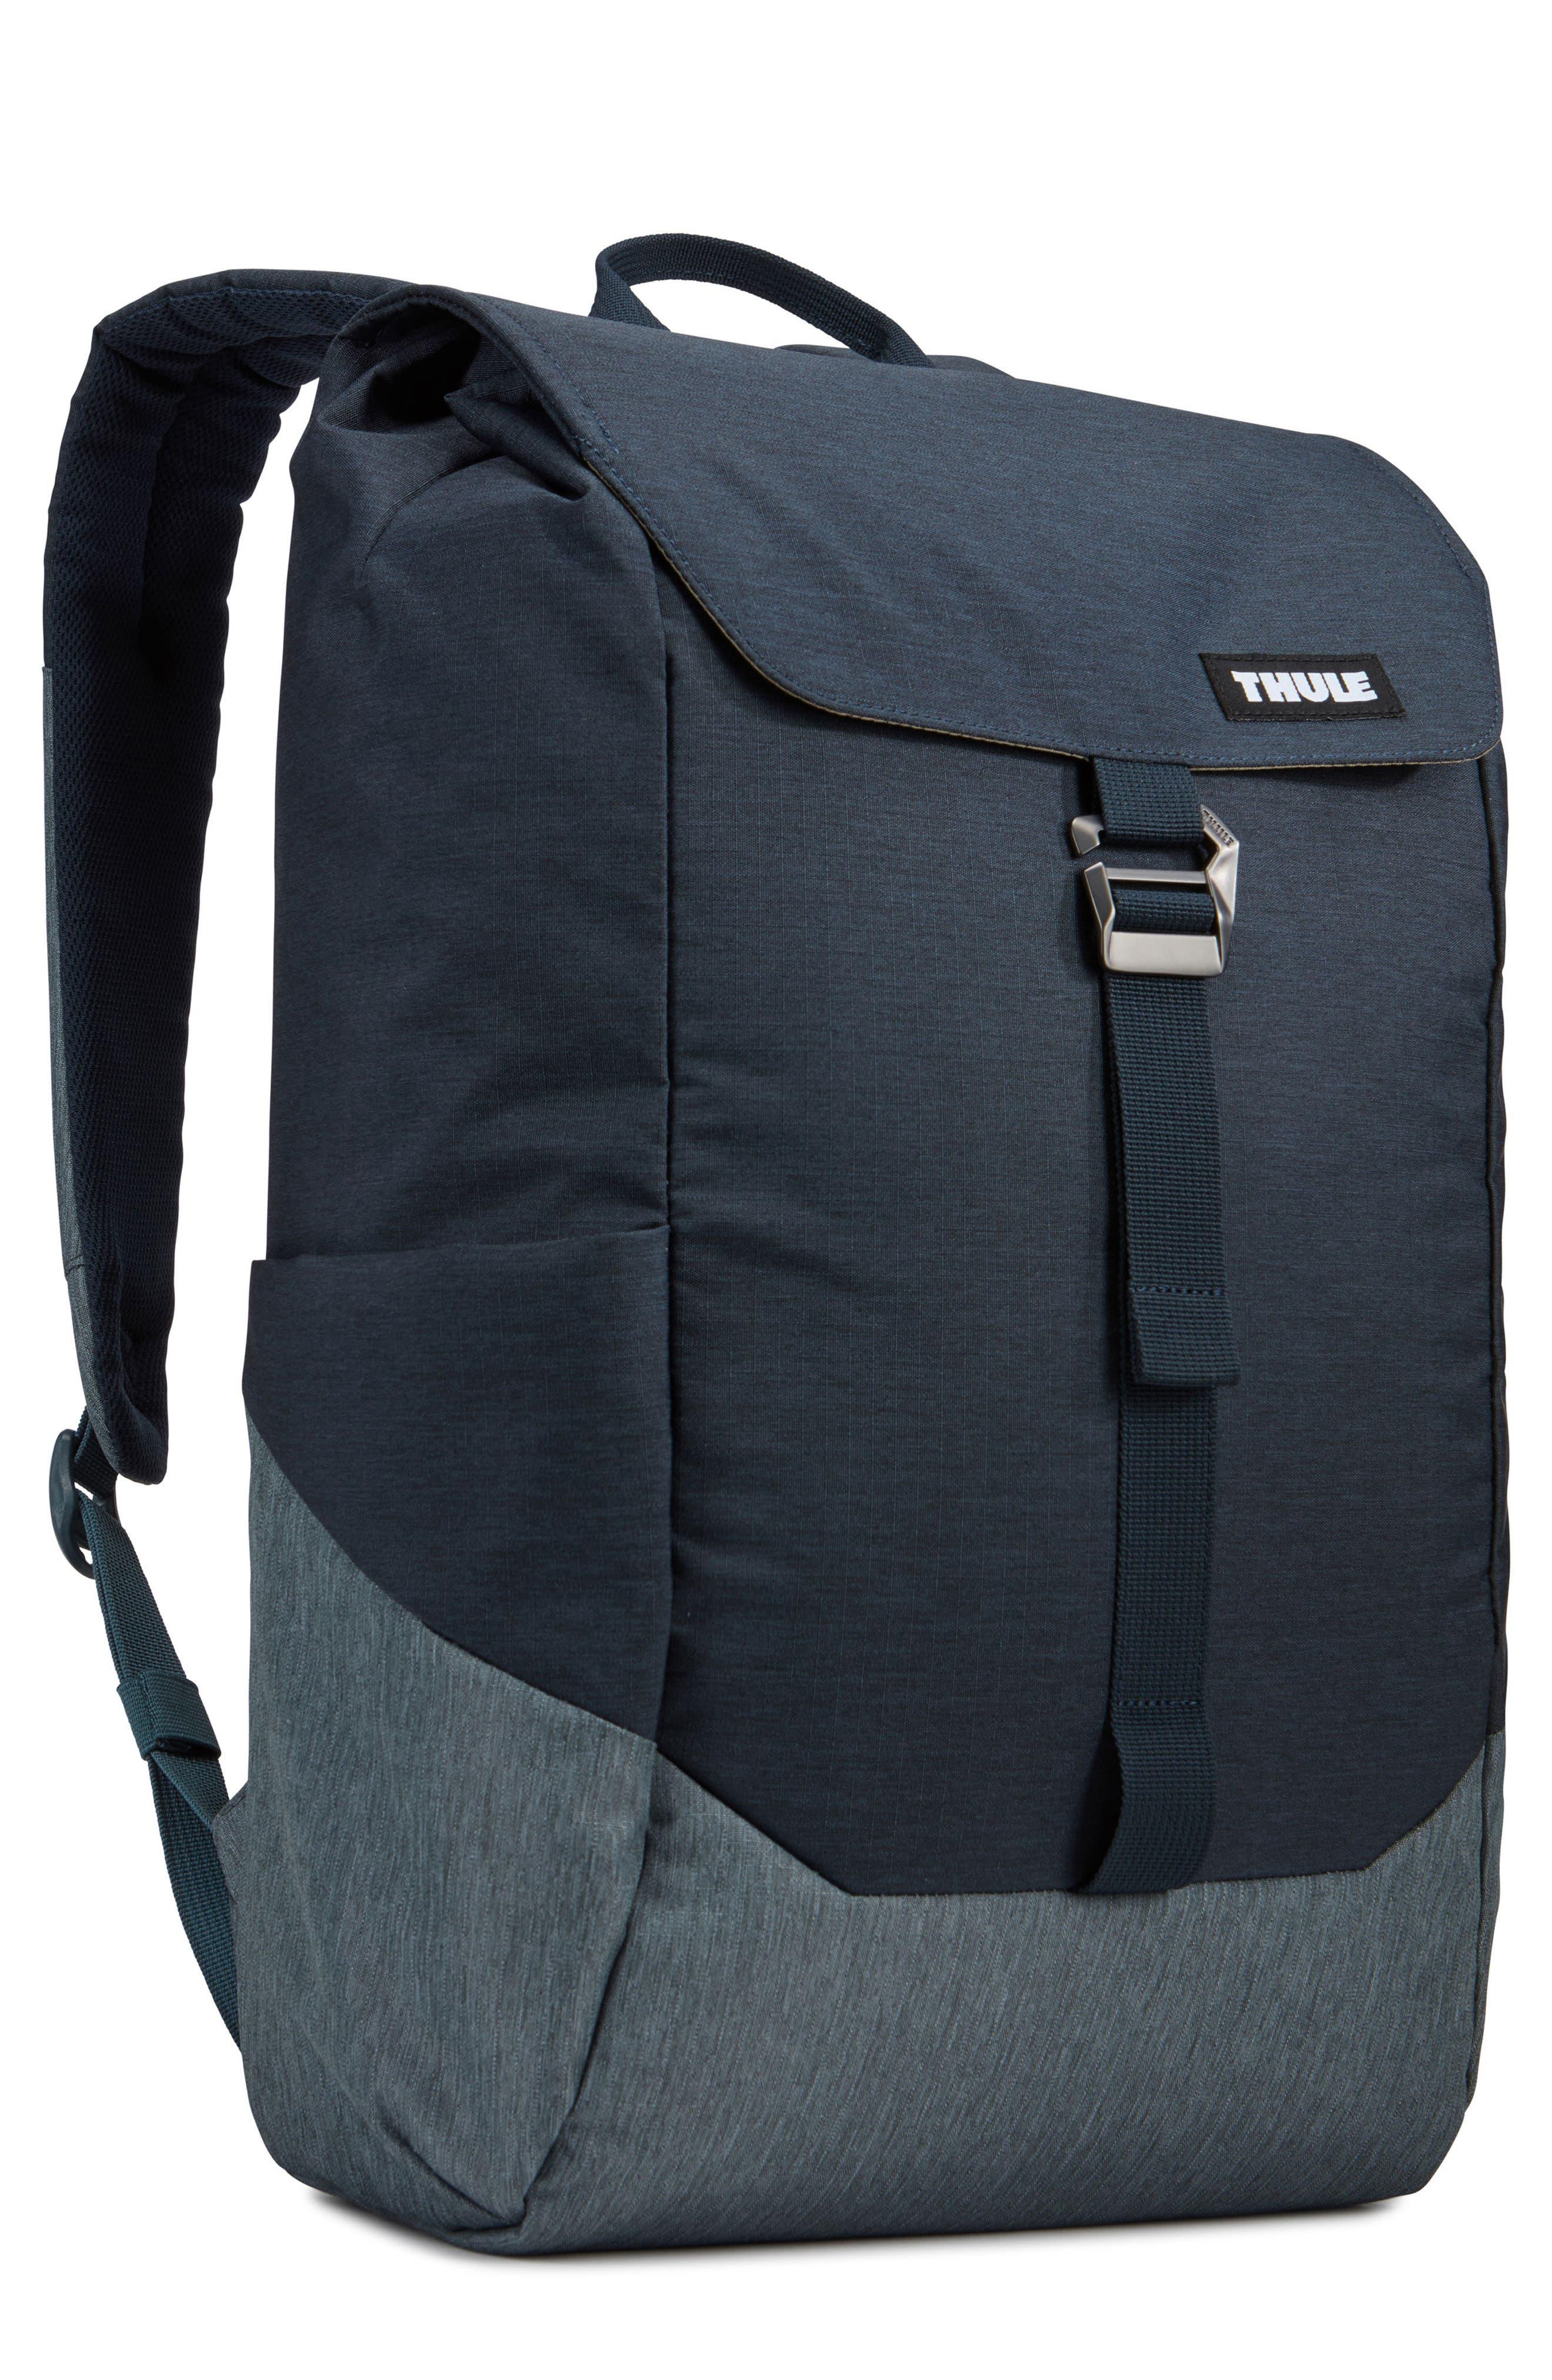 Lithos Backpack,                         Main,                         color, CARBON BLUE